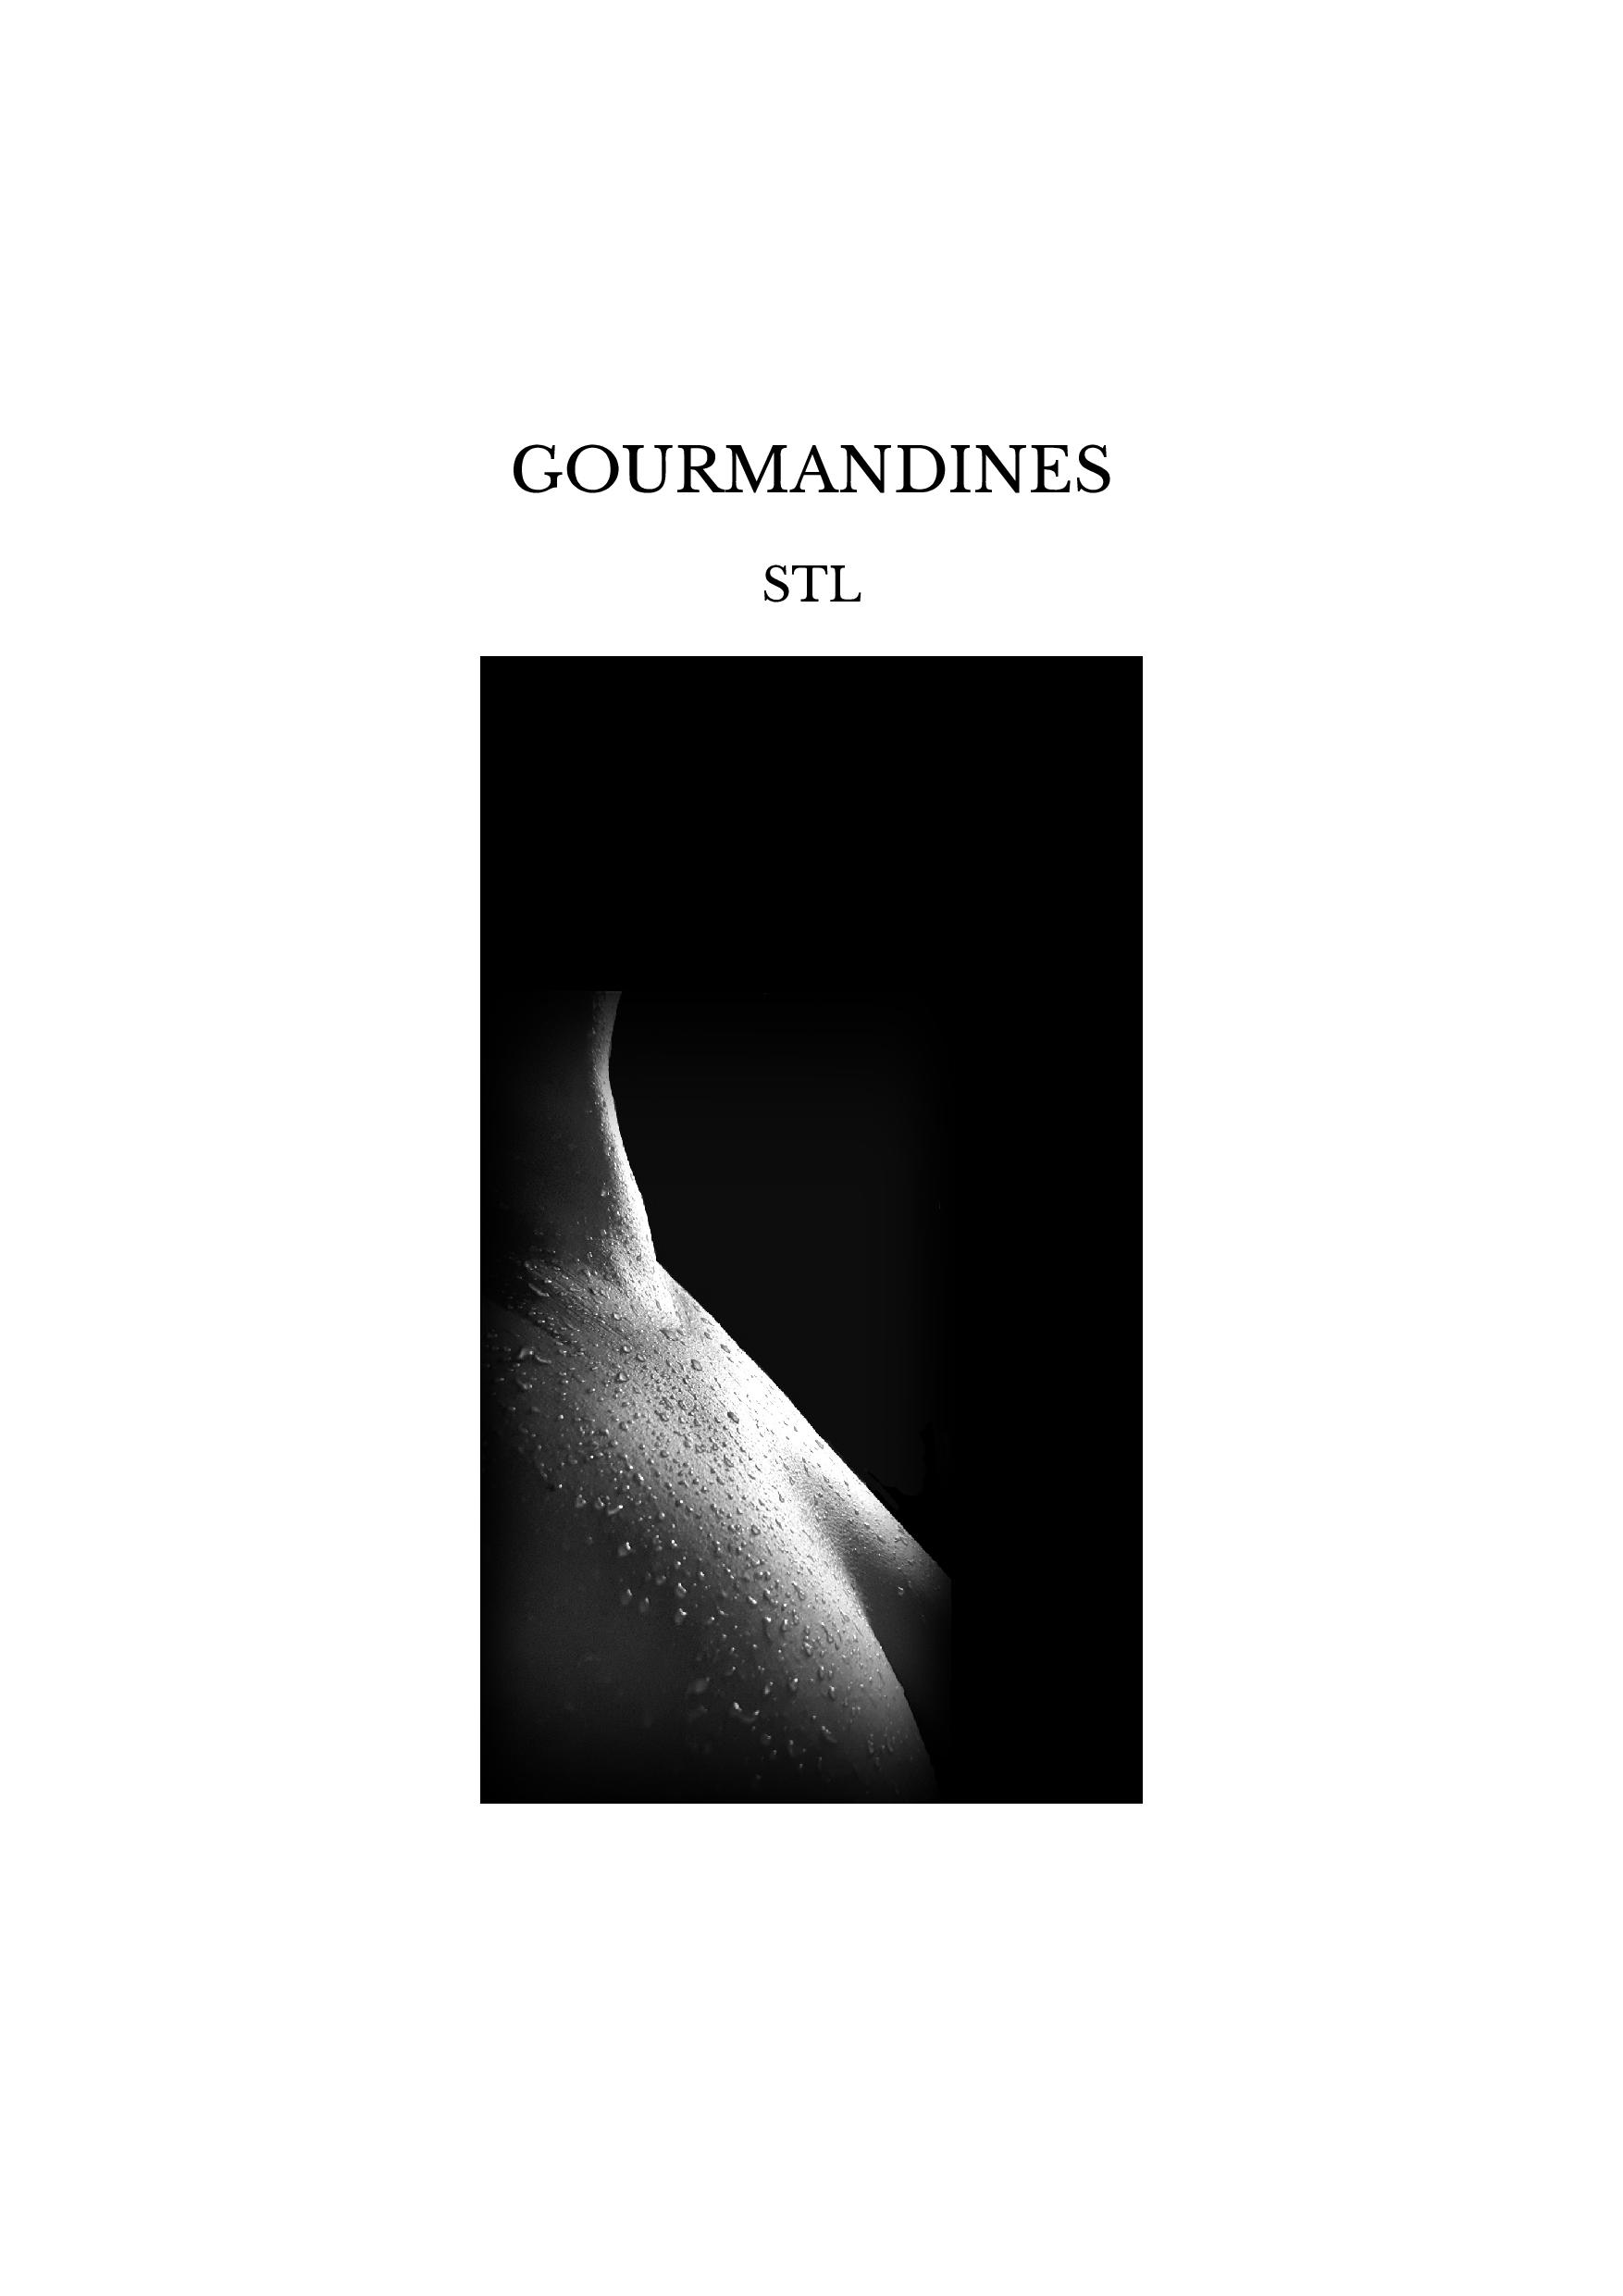 GOURMANDINES